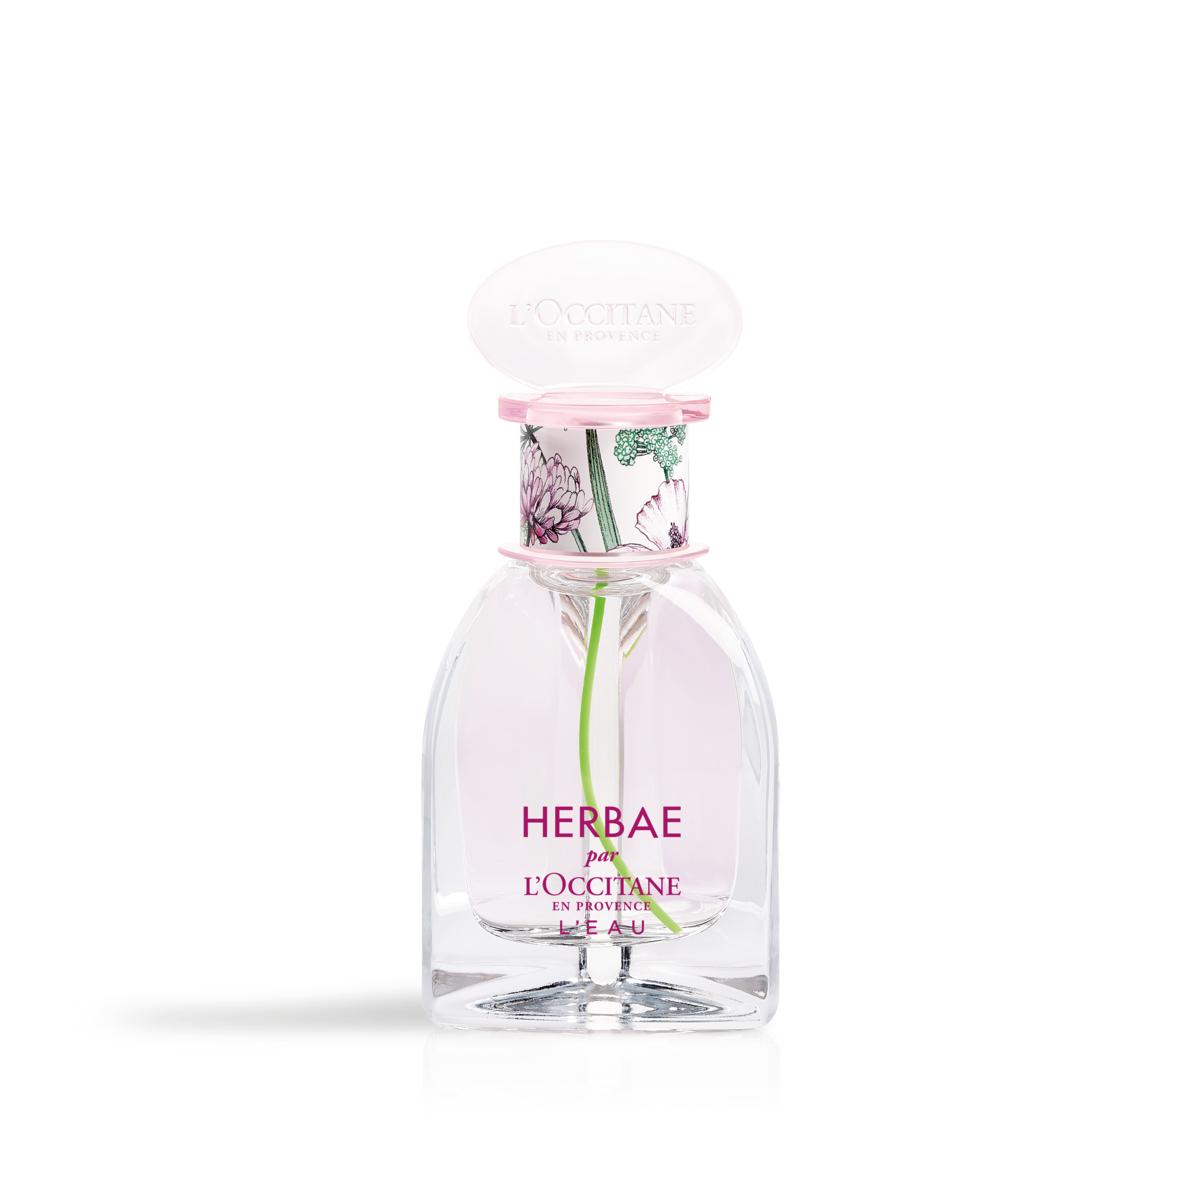 L'Occitane Herbae L'Eau profumo